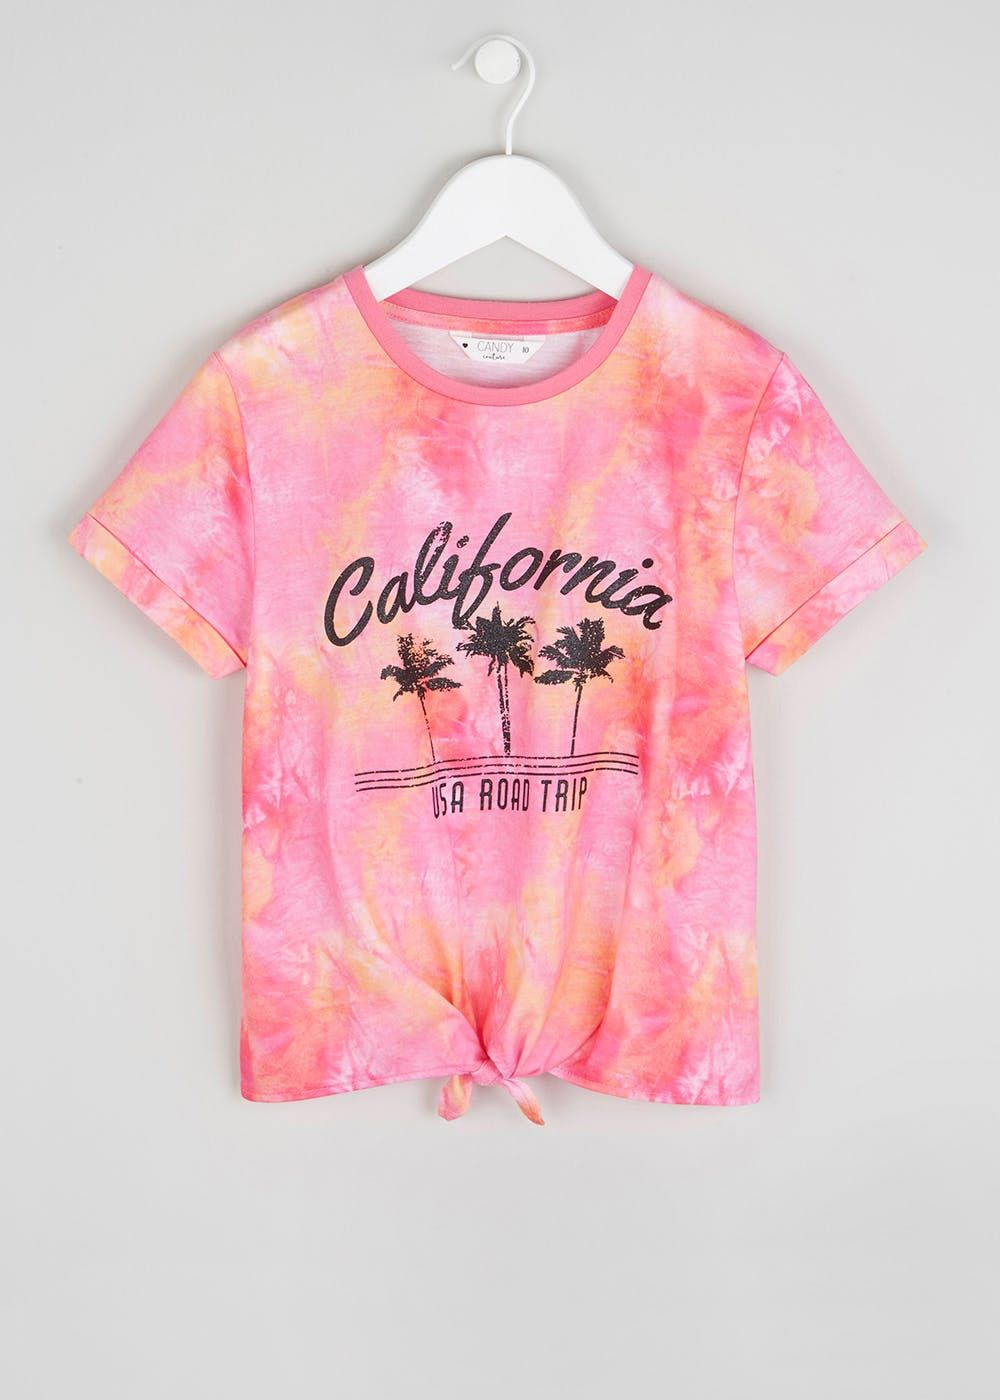 bec857f176 Girls Candy Couture Tie Dye T-Shirt (9-16yrs) – Pink – Matalan